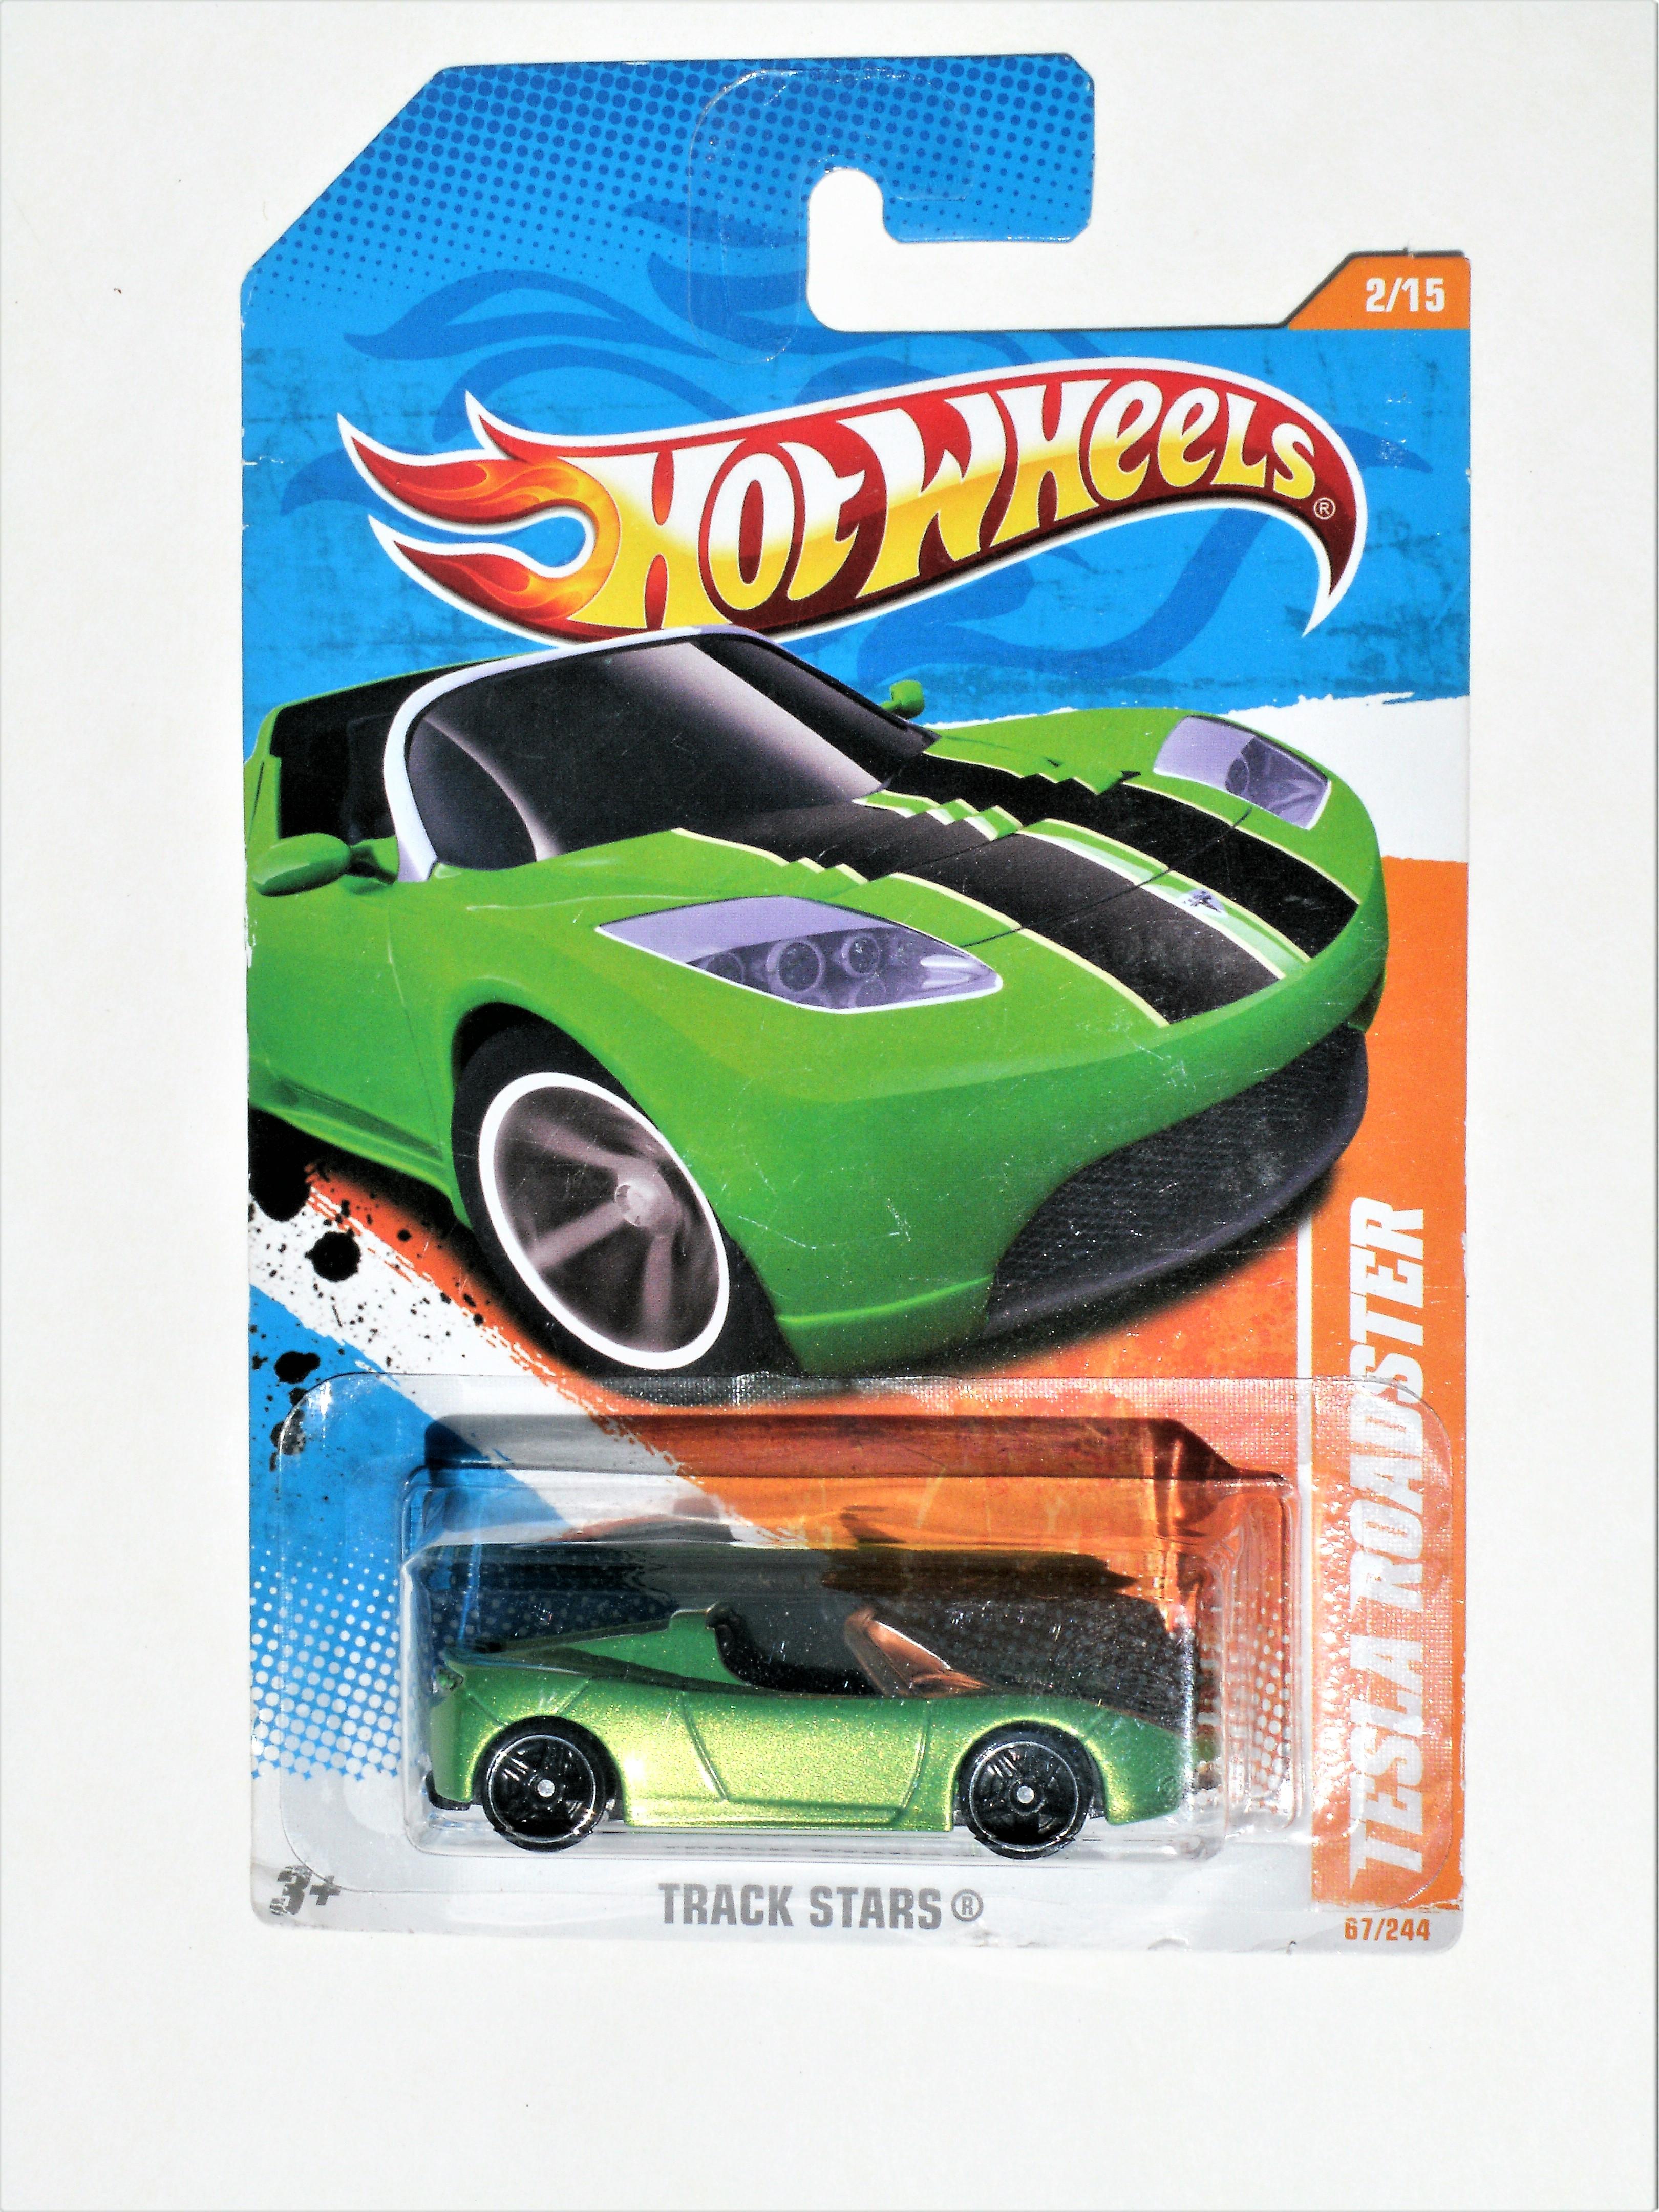 007a,TeslaRoadster,TrackStars,Green-Black,Long.JPG